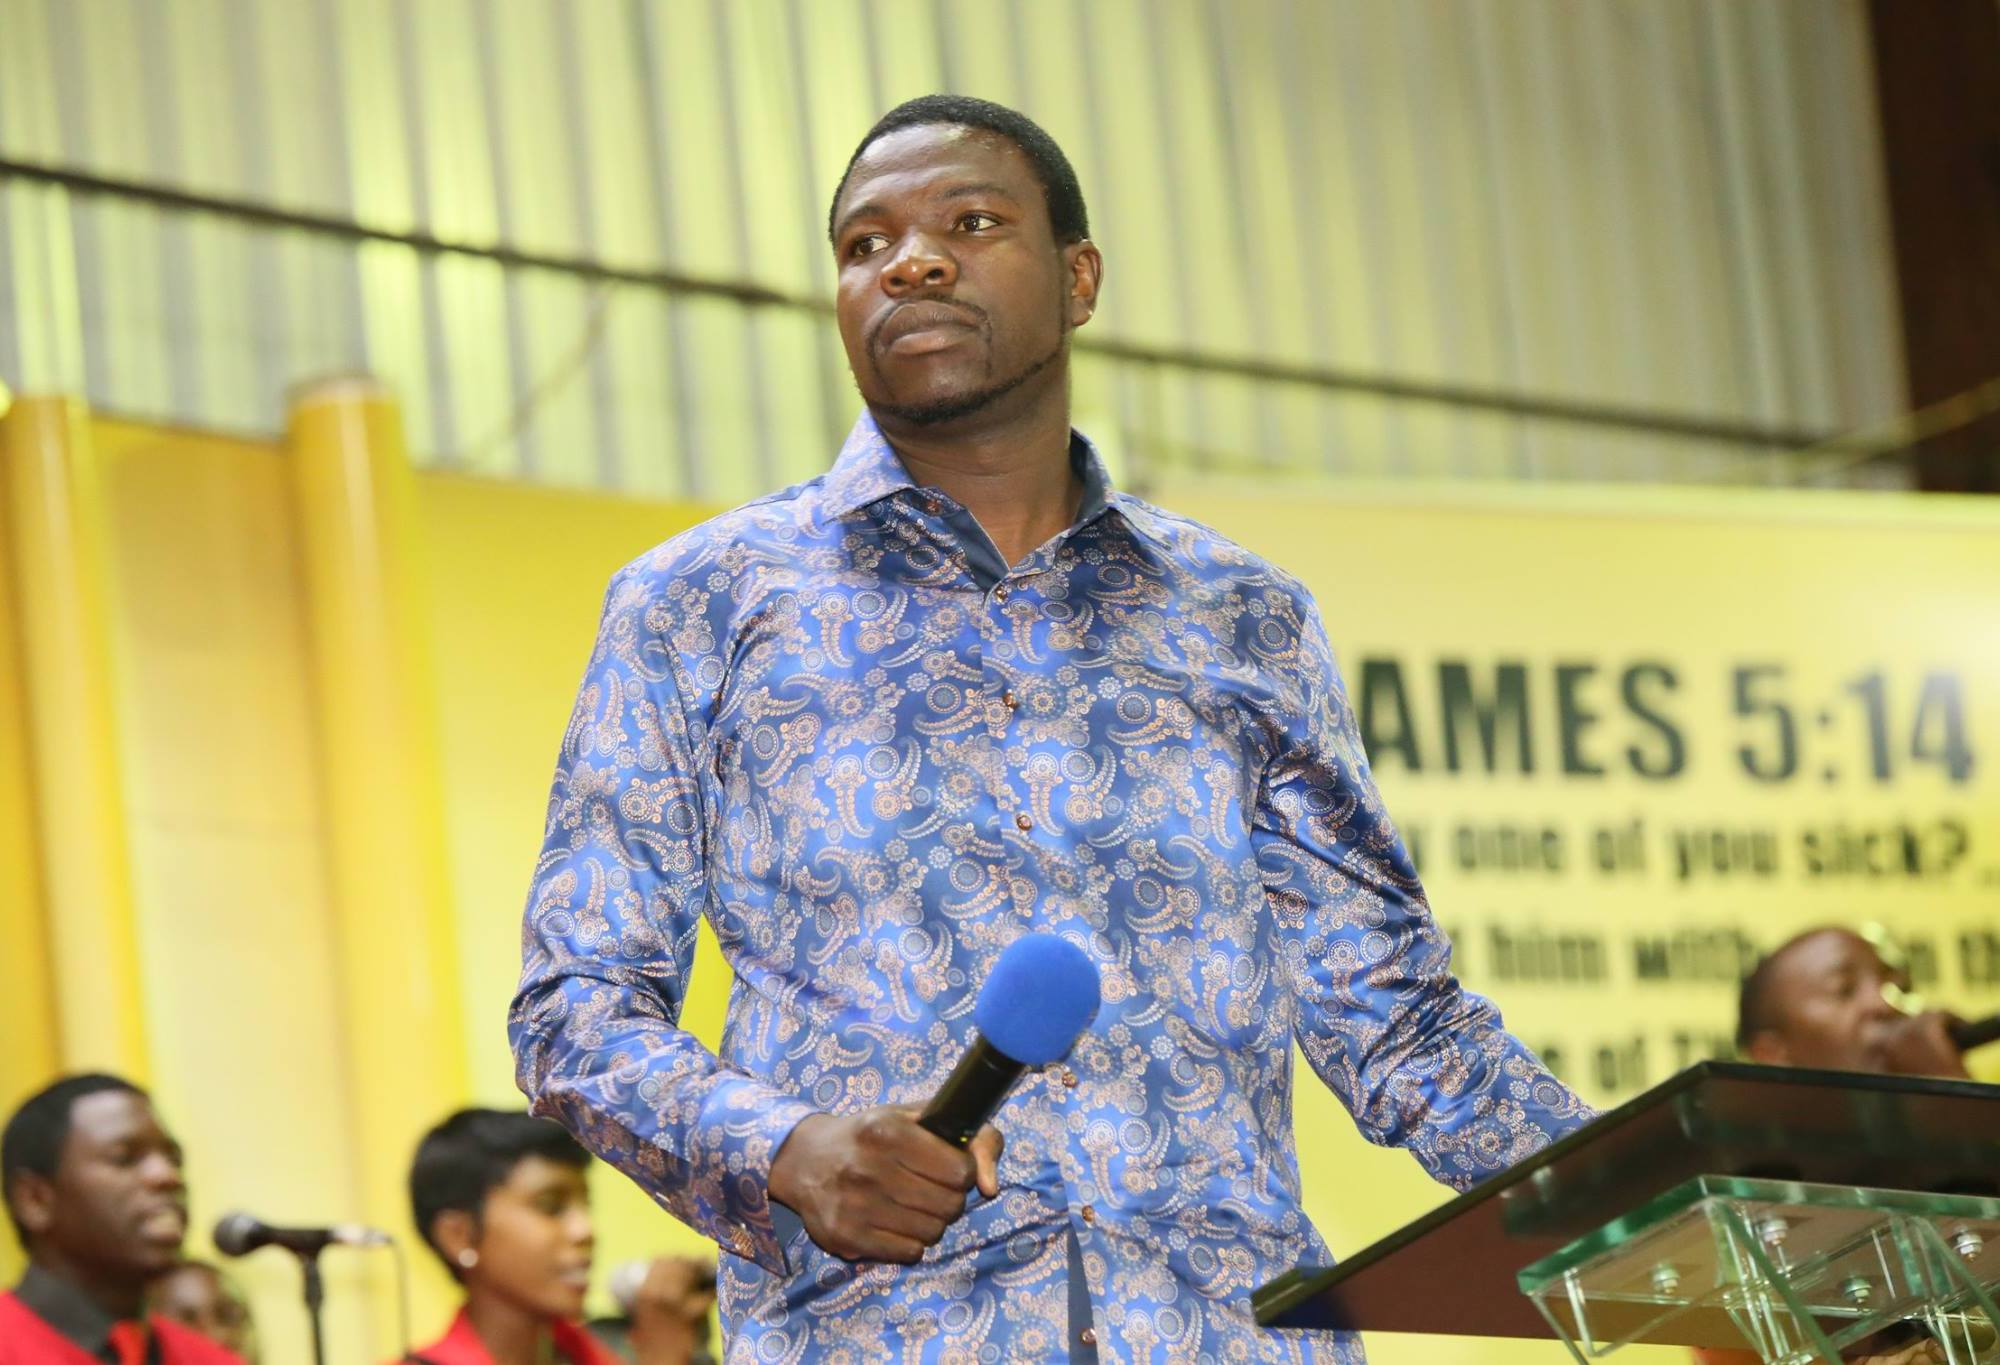 Prophet Walter Magaya